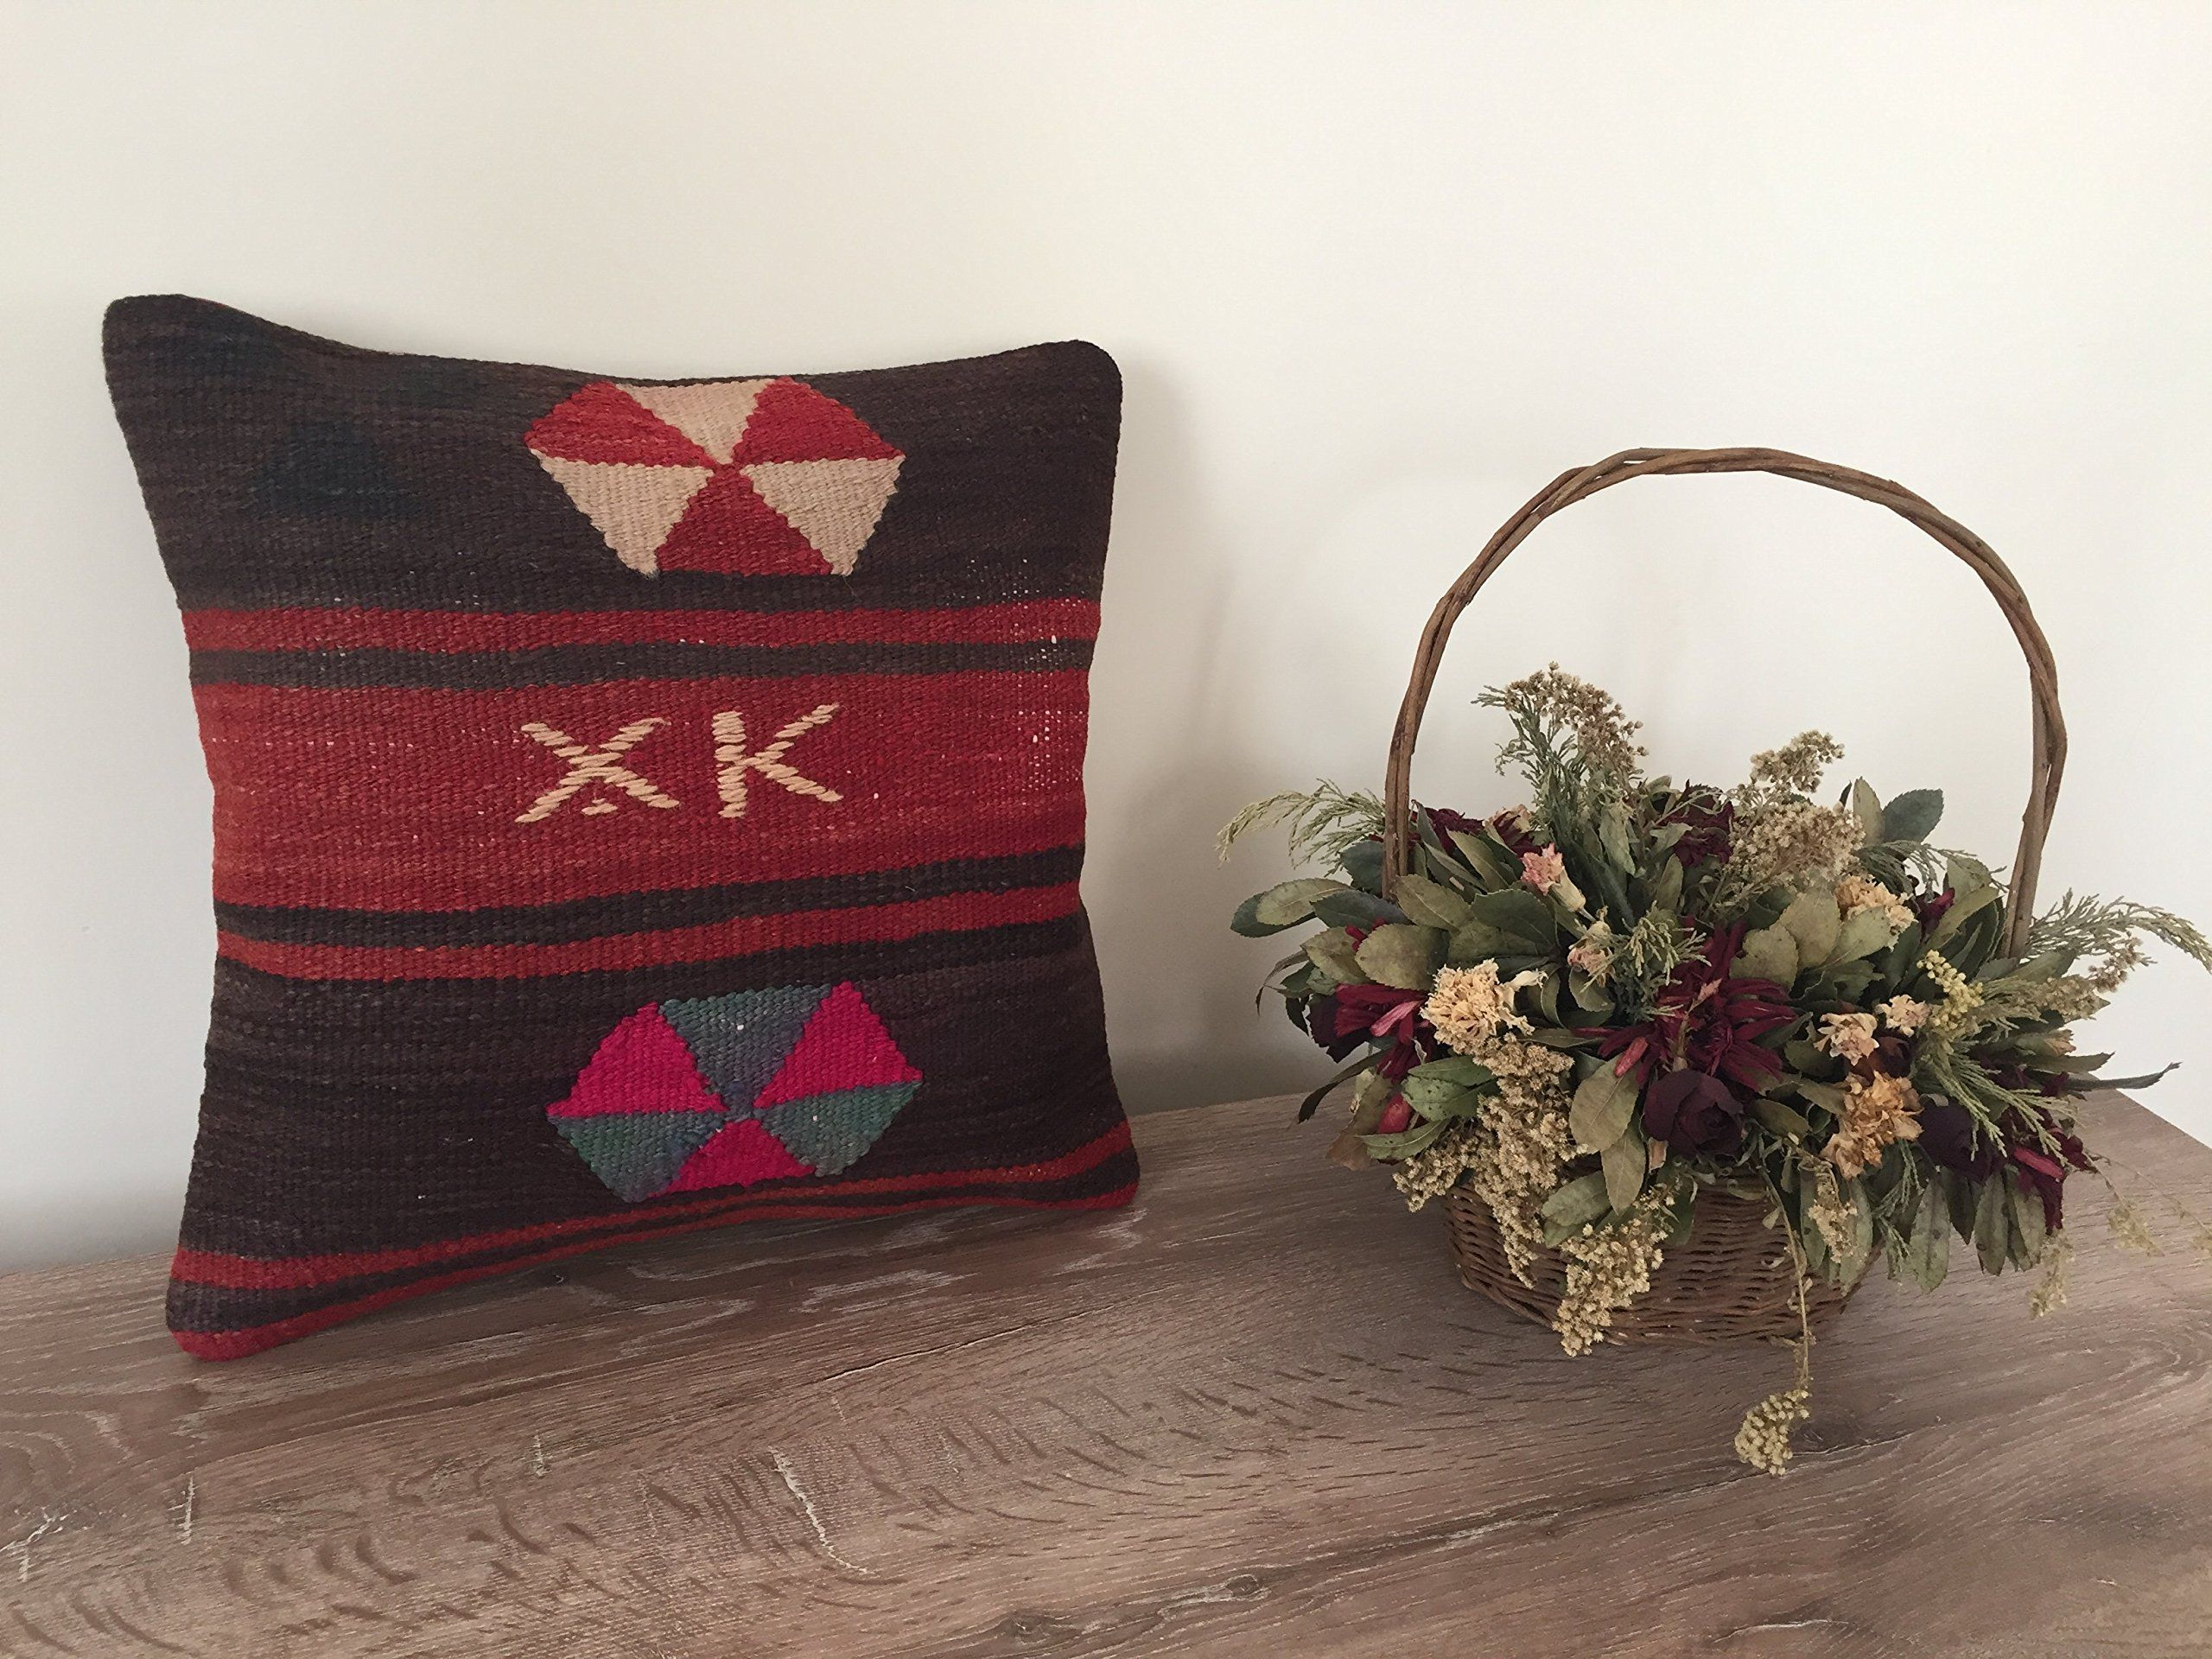 Kilim pillow uu x uu anatolian turkish cushion cover cm x